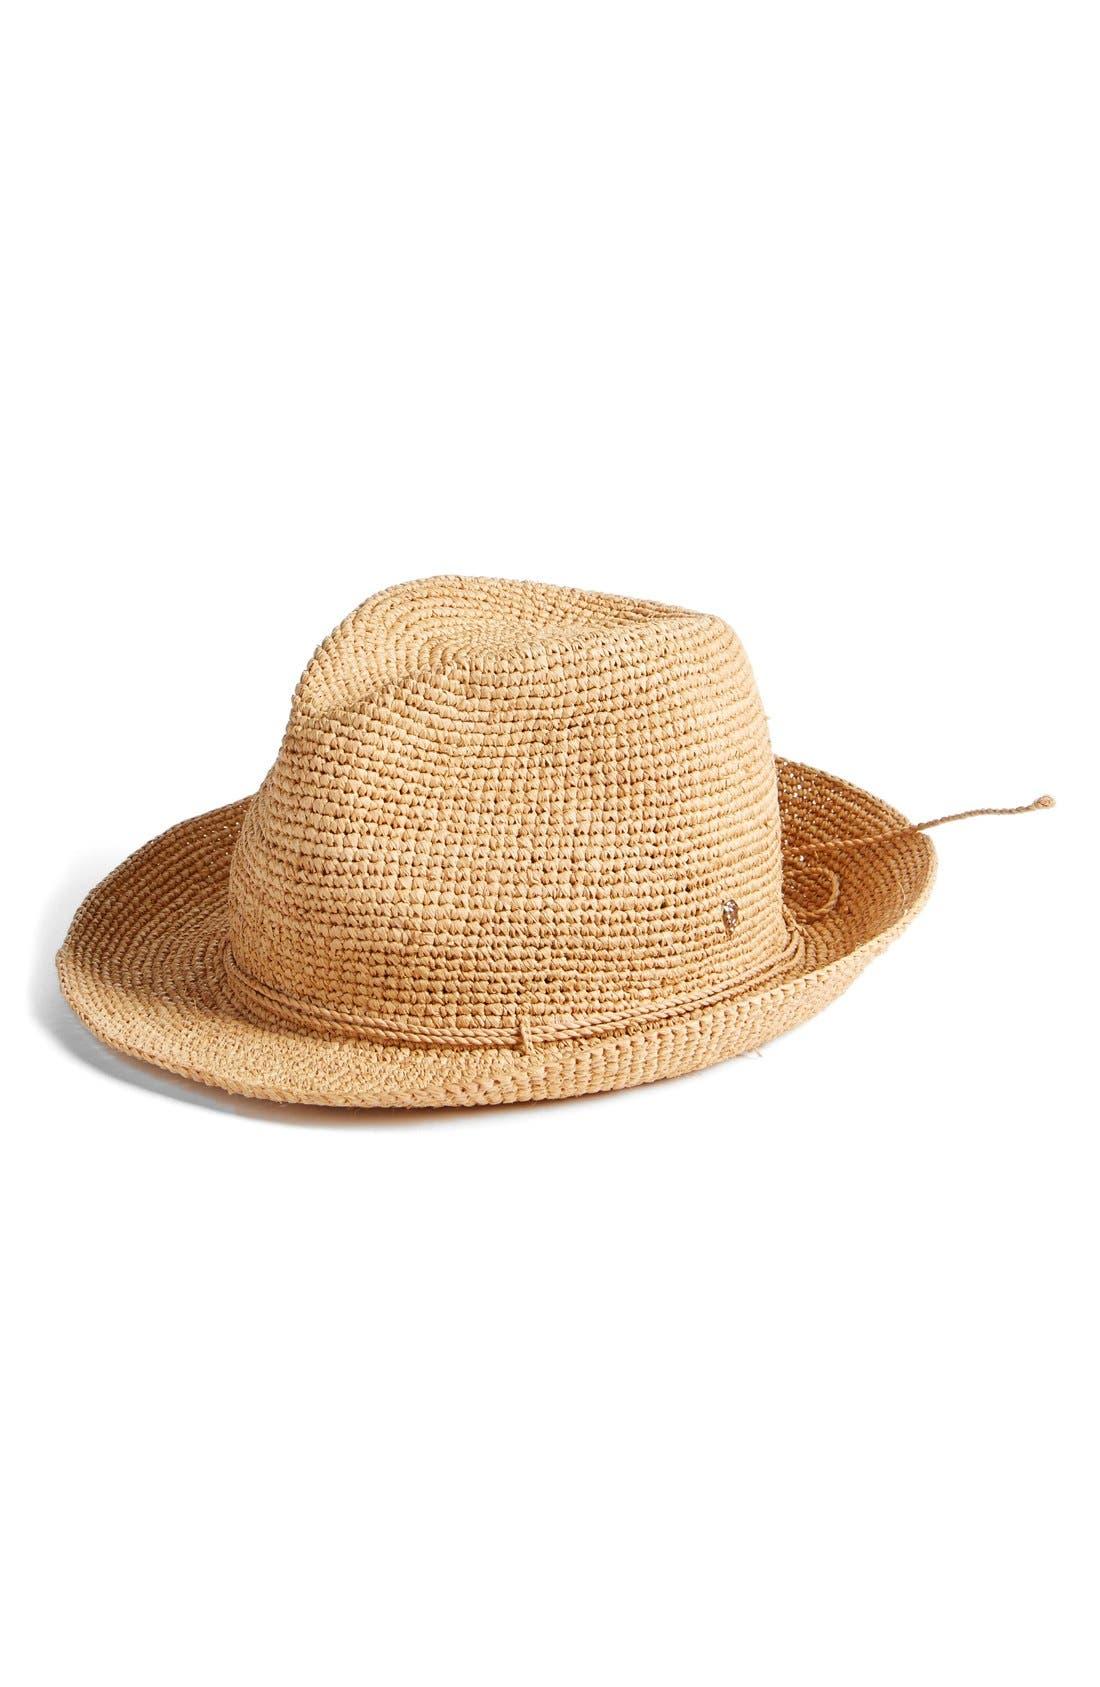 Raffia Crochet Packable Sun Hat